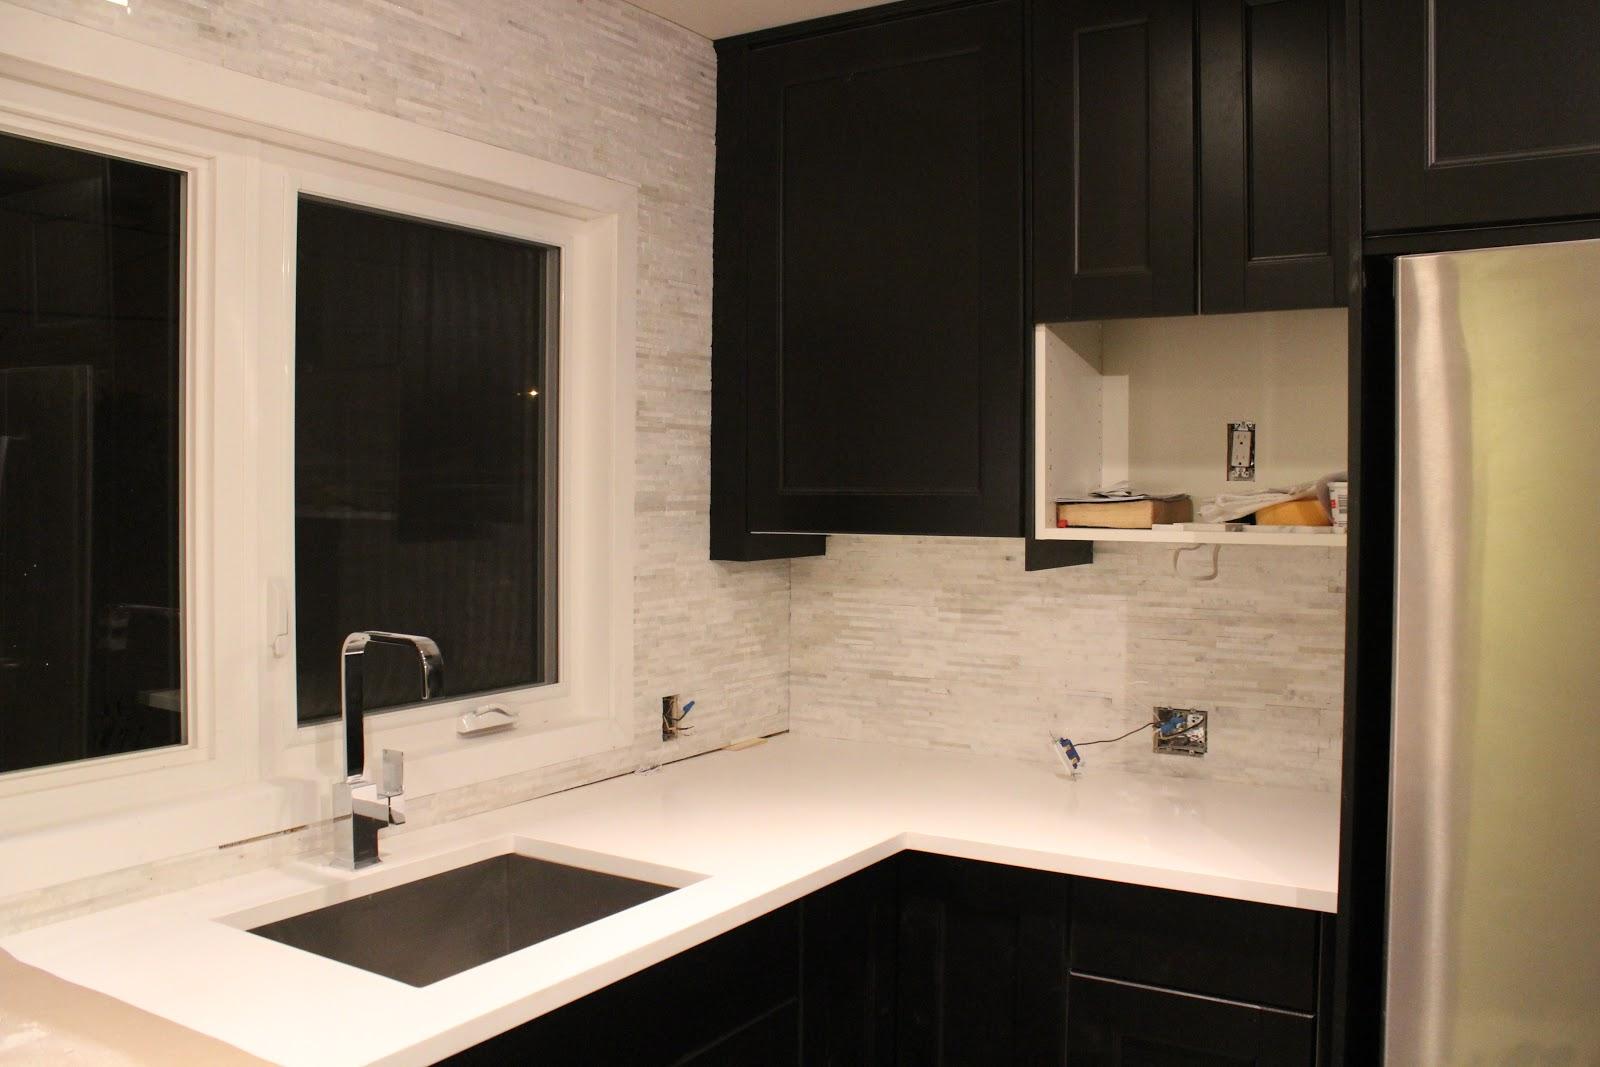 Pretty Swanky Digs Ikea Ramsjo Kitchen Reno In Progress